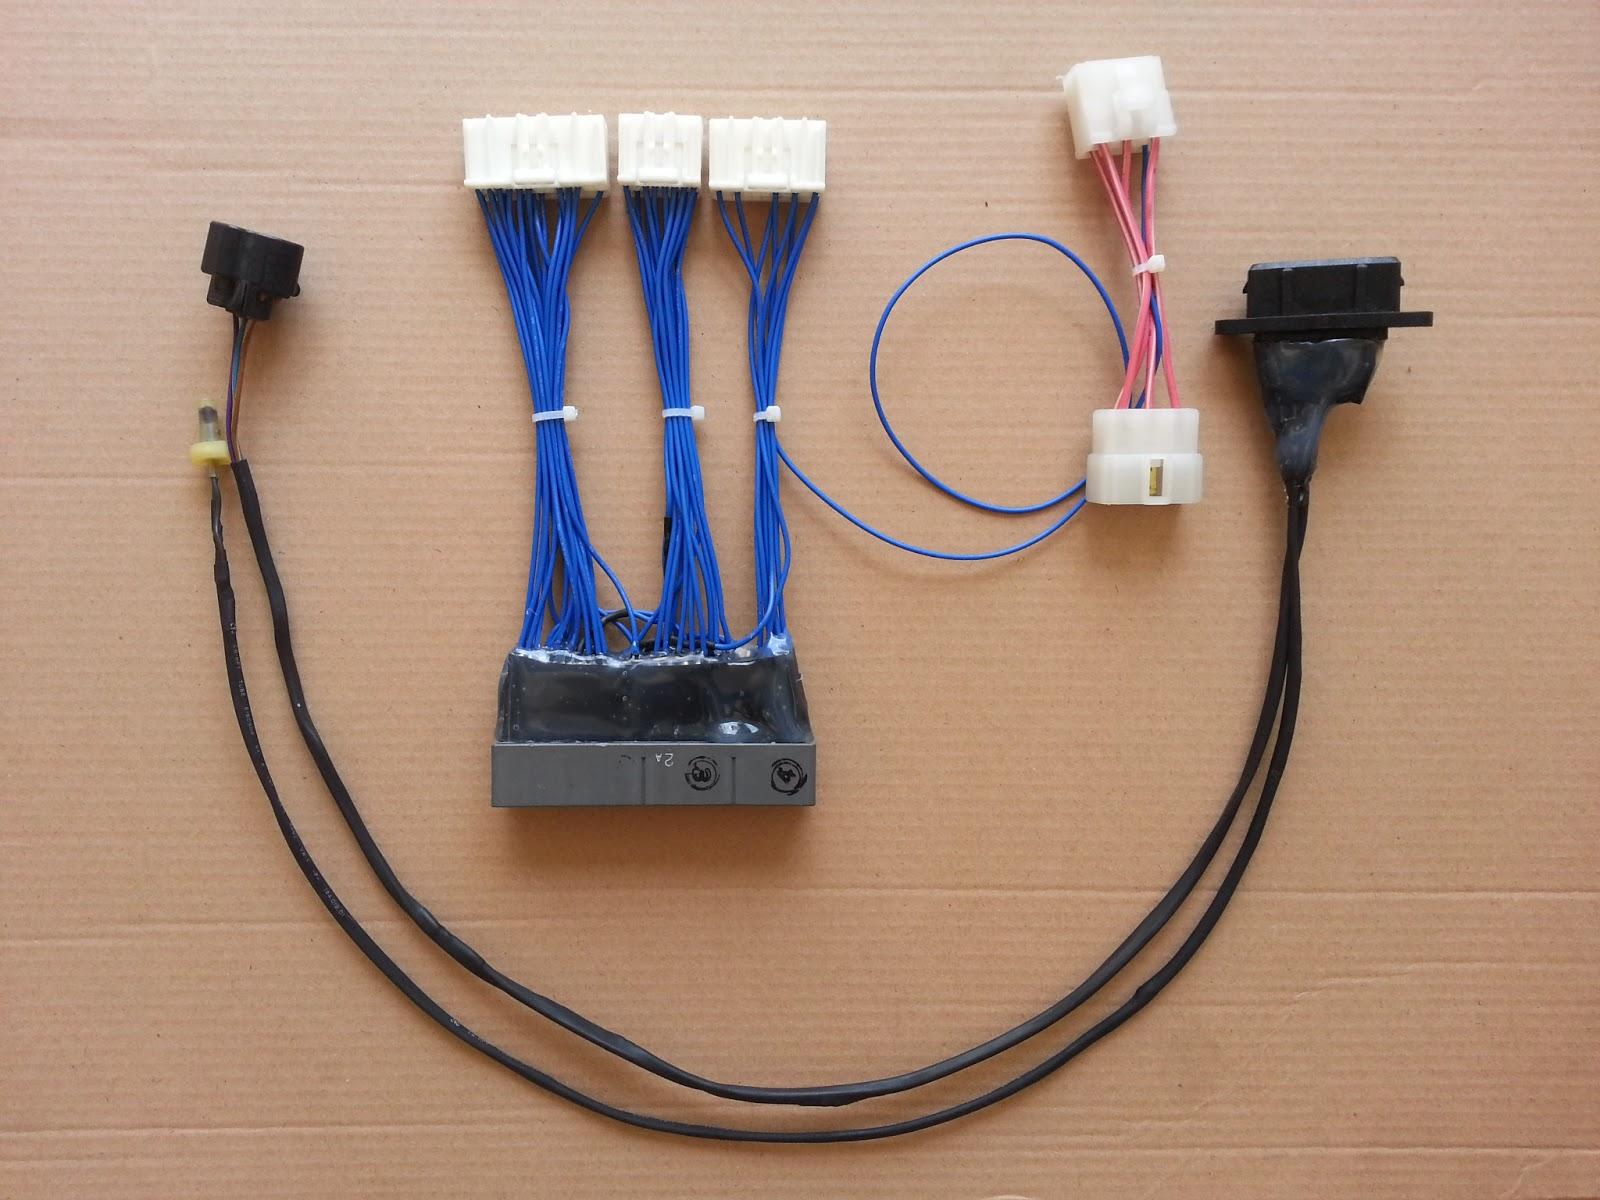 4age Blacktop Wiring Diagram Ostrich Skeleton Toyota 20v 4ag Engine Free Image For User